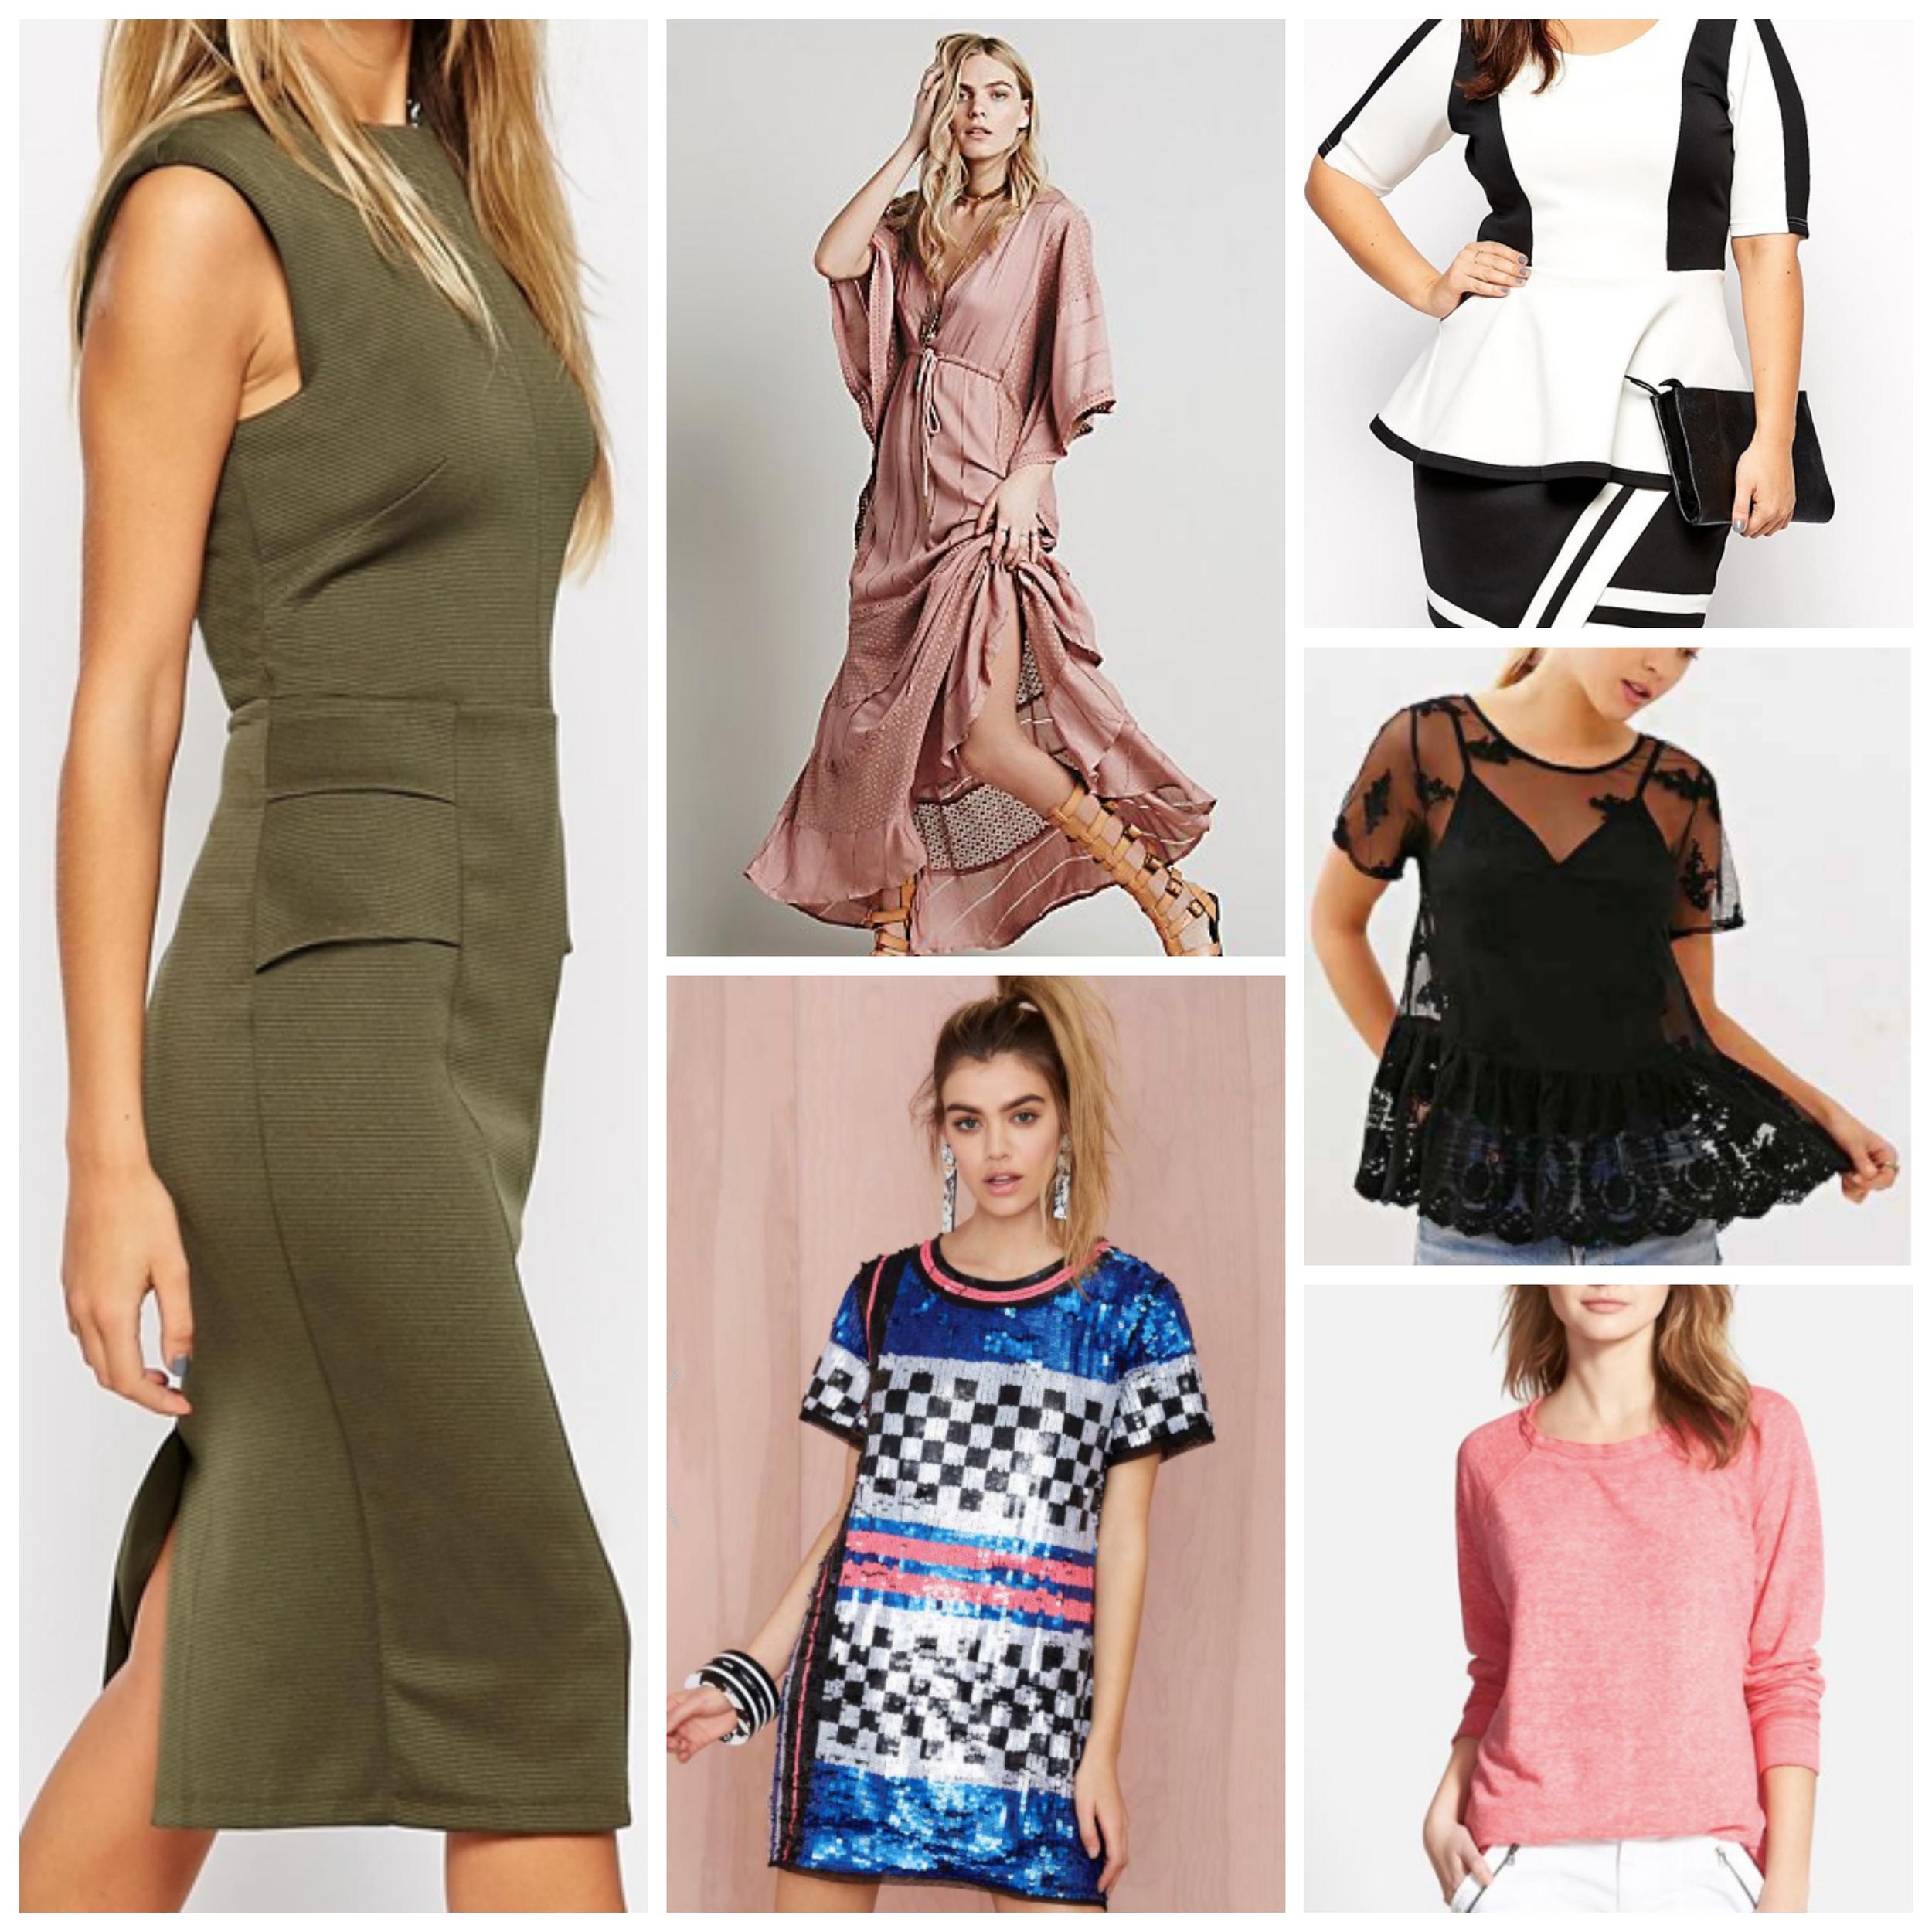 five basic fashion styles